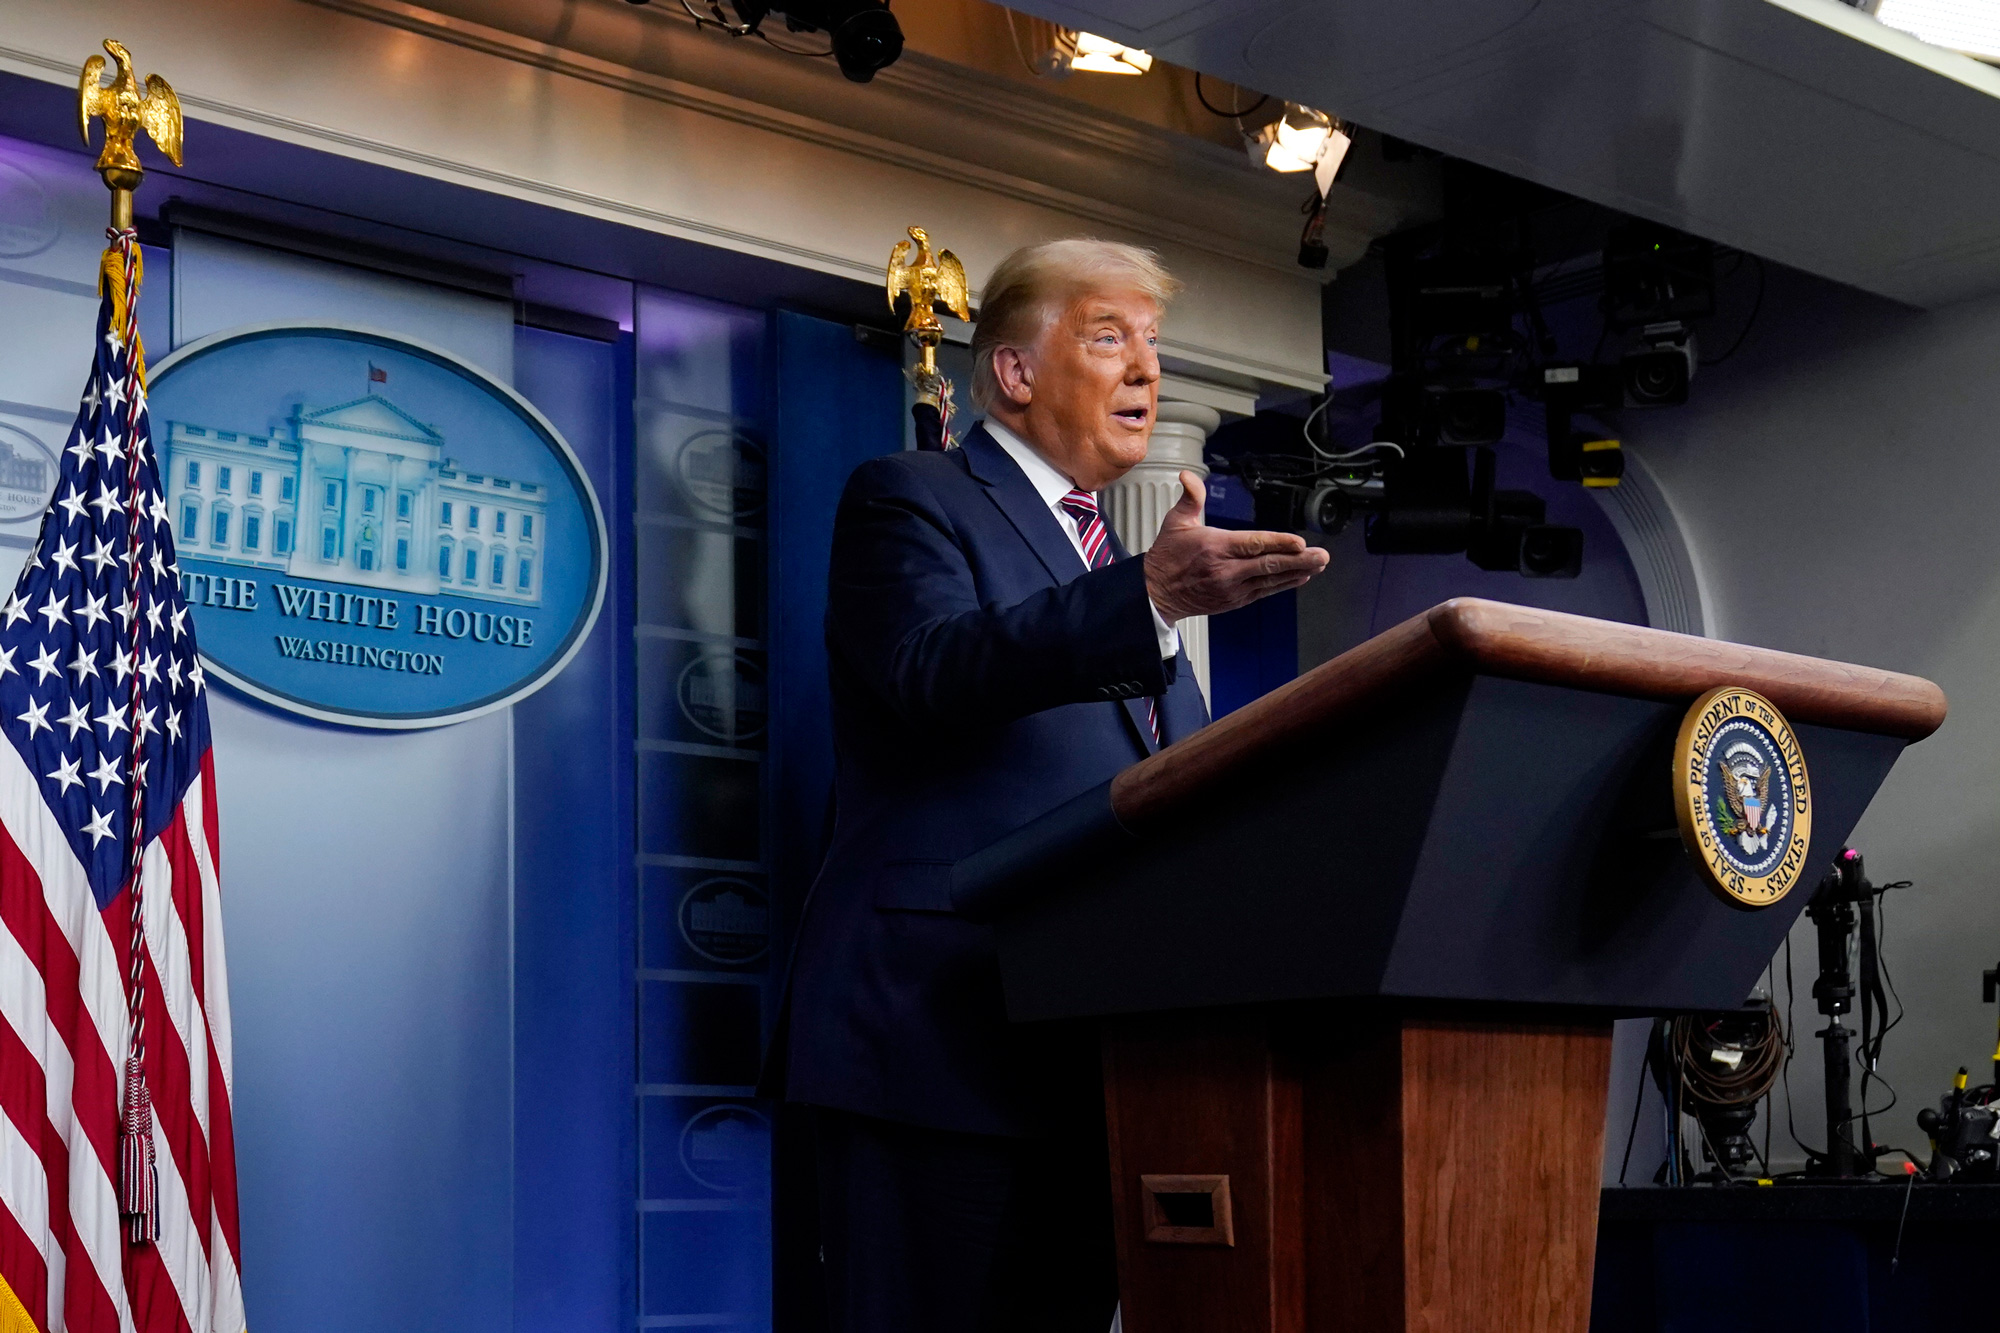 President Donald Trump speaks at the White House, Thursday, Nov. 5, 2020, in Washington, DC.